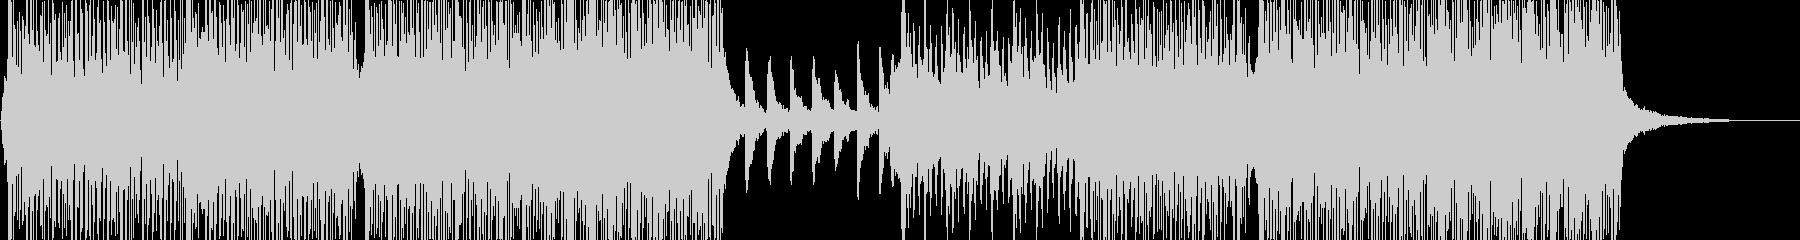 V-LOGなどおしゃれな映像に合う曲の未再生の波形